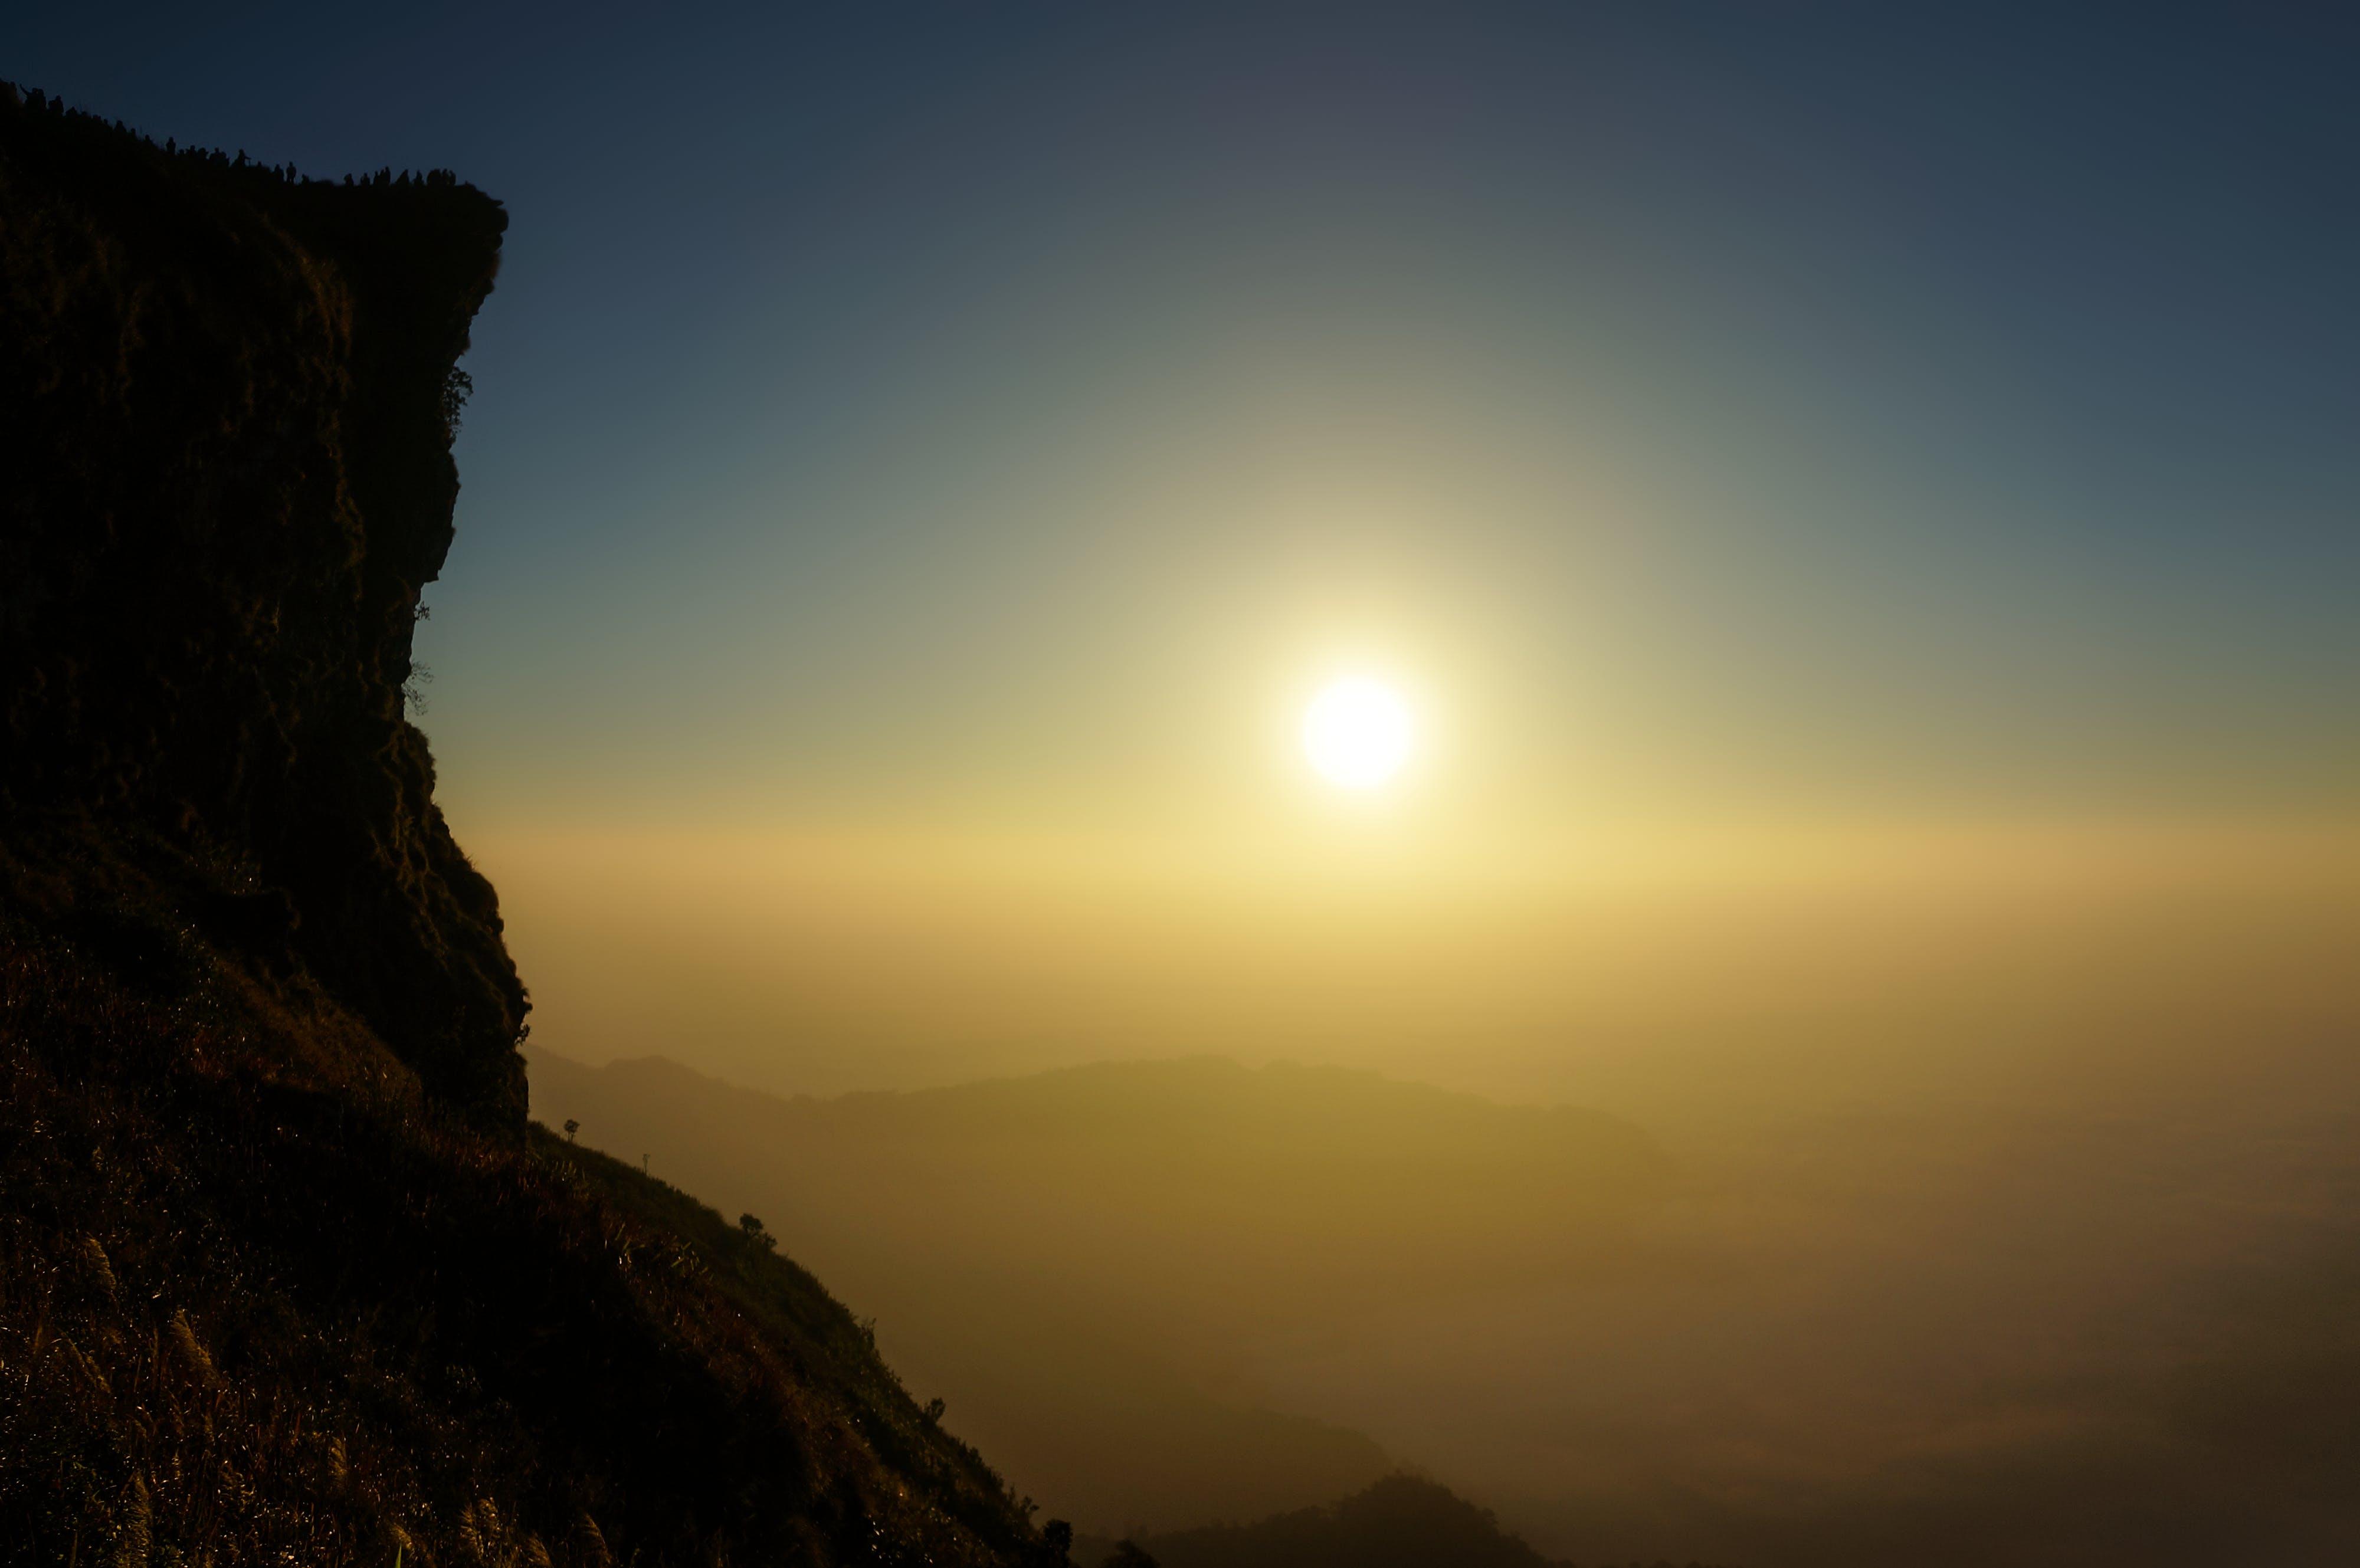 Kostenloses Stock Foto zu berg, felswand, himmel, natur